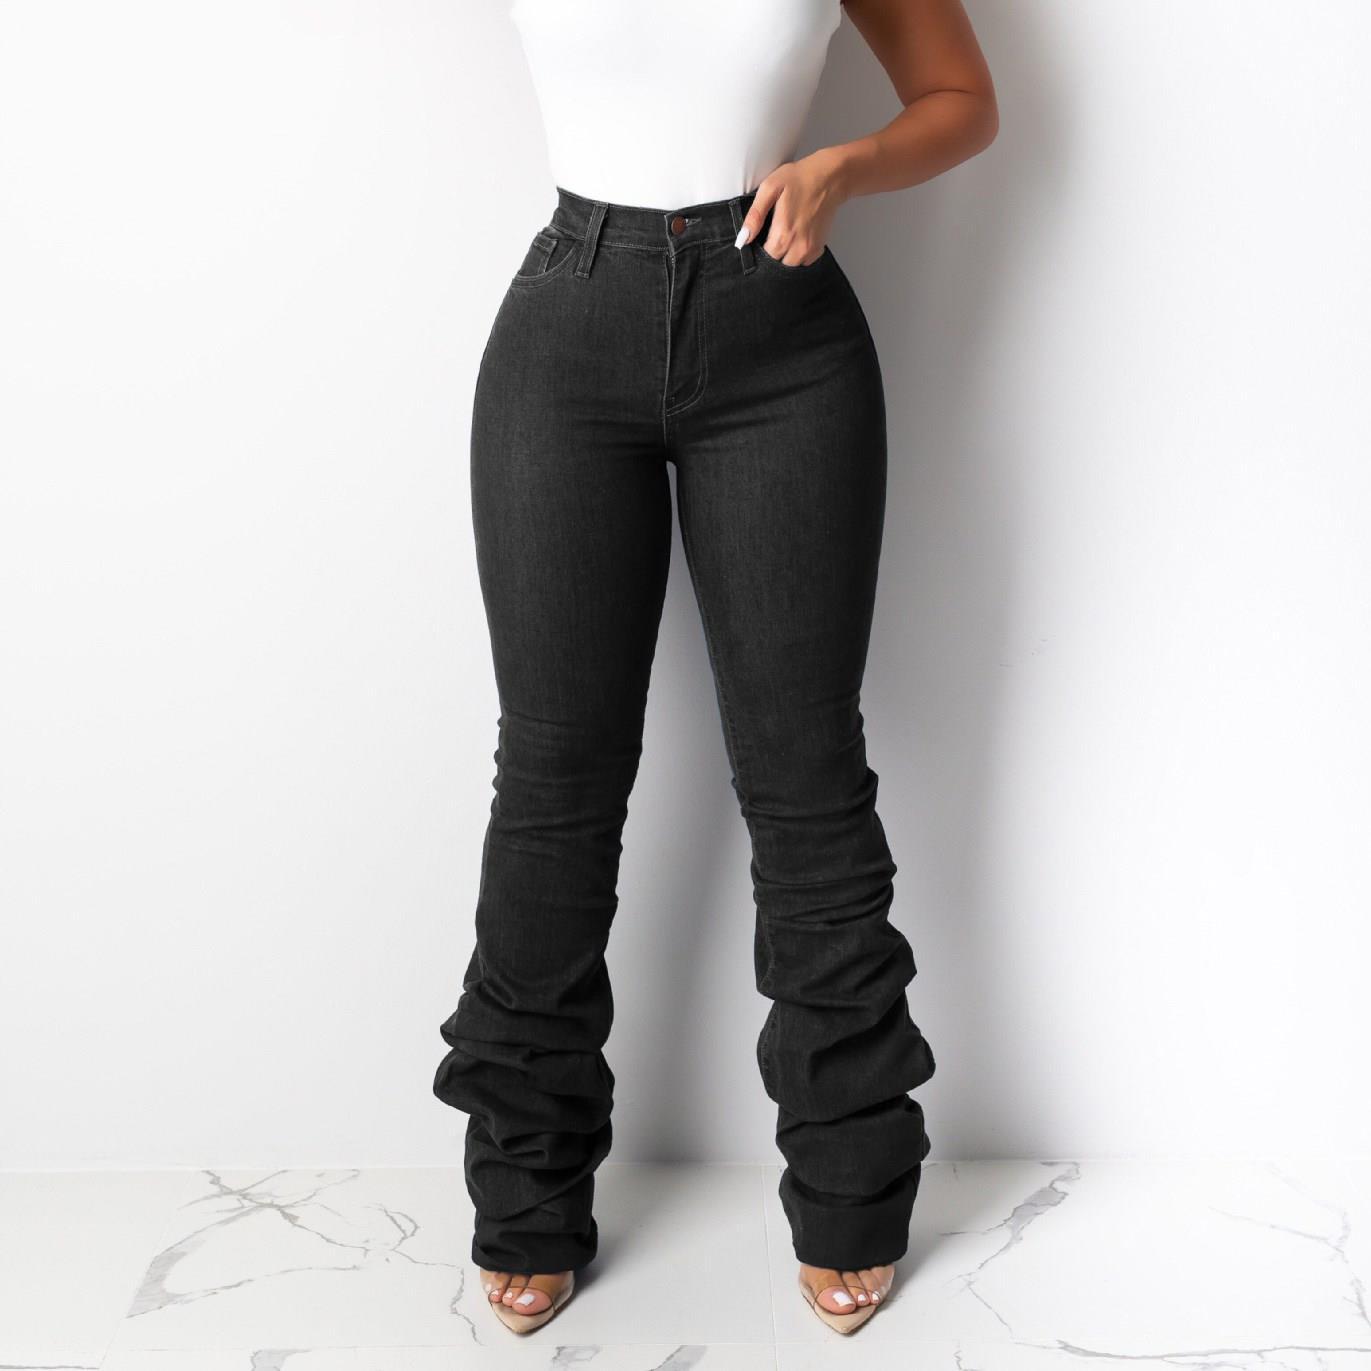 Newest Women Blue Heap Heap Jeans Autumn Winter Fashion Styles Denim Pants High Waist Pockets Skinny Jeans